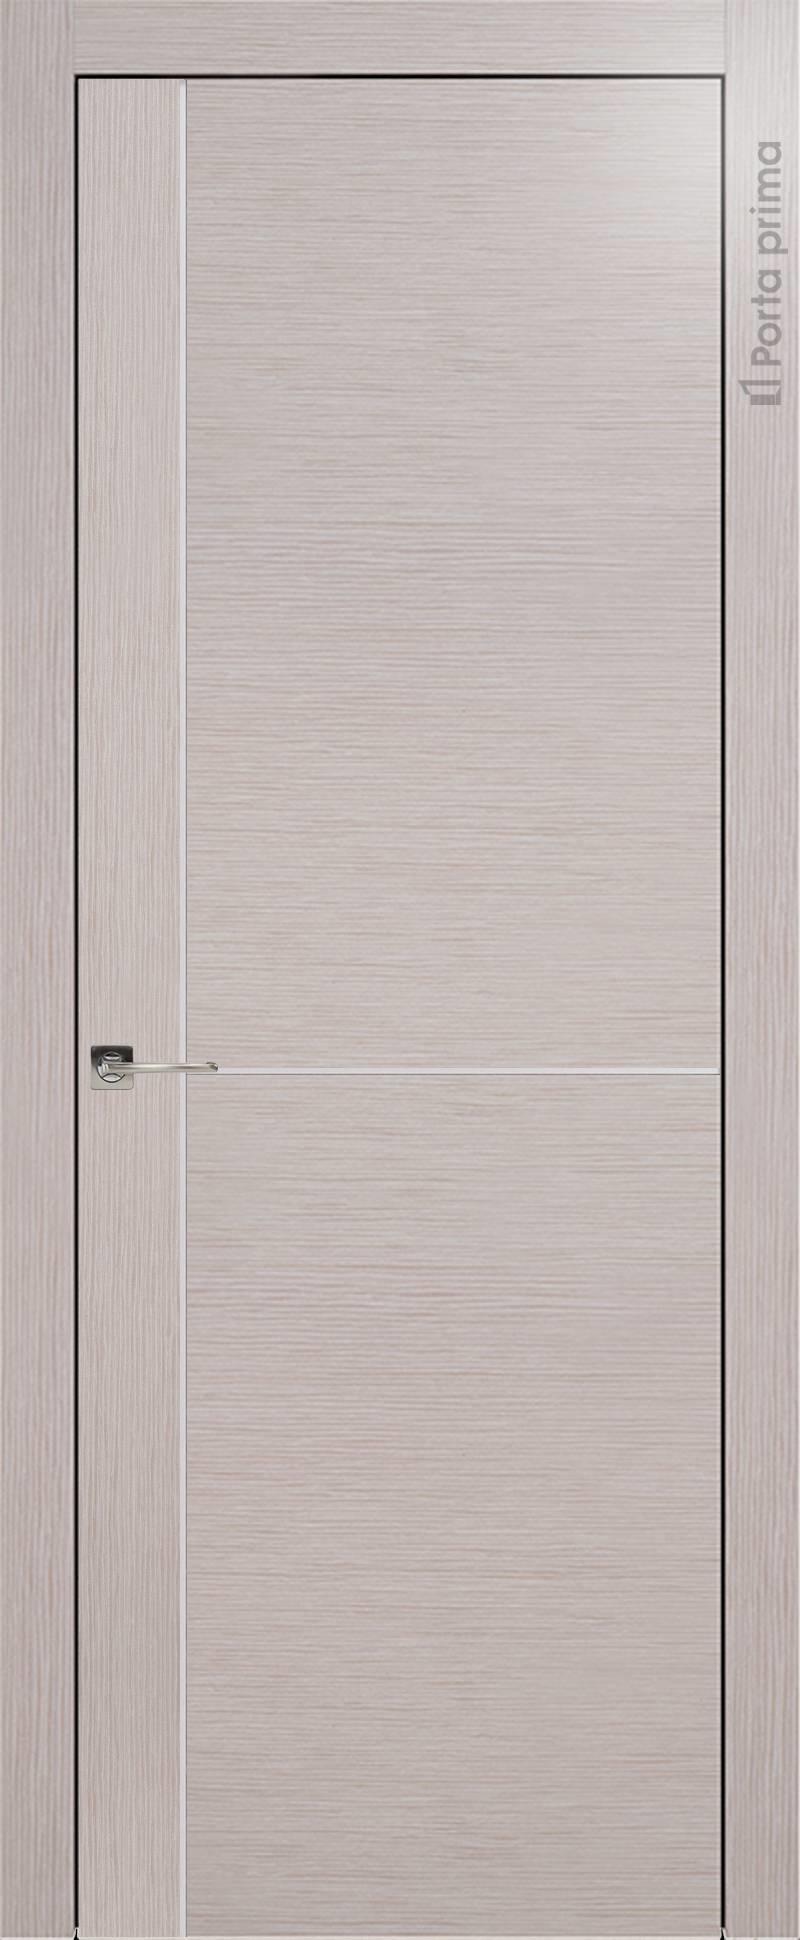 Tivoli Е-3 цвет - Дымчатый дуб Без стекла (ДГ)